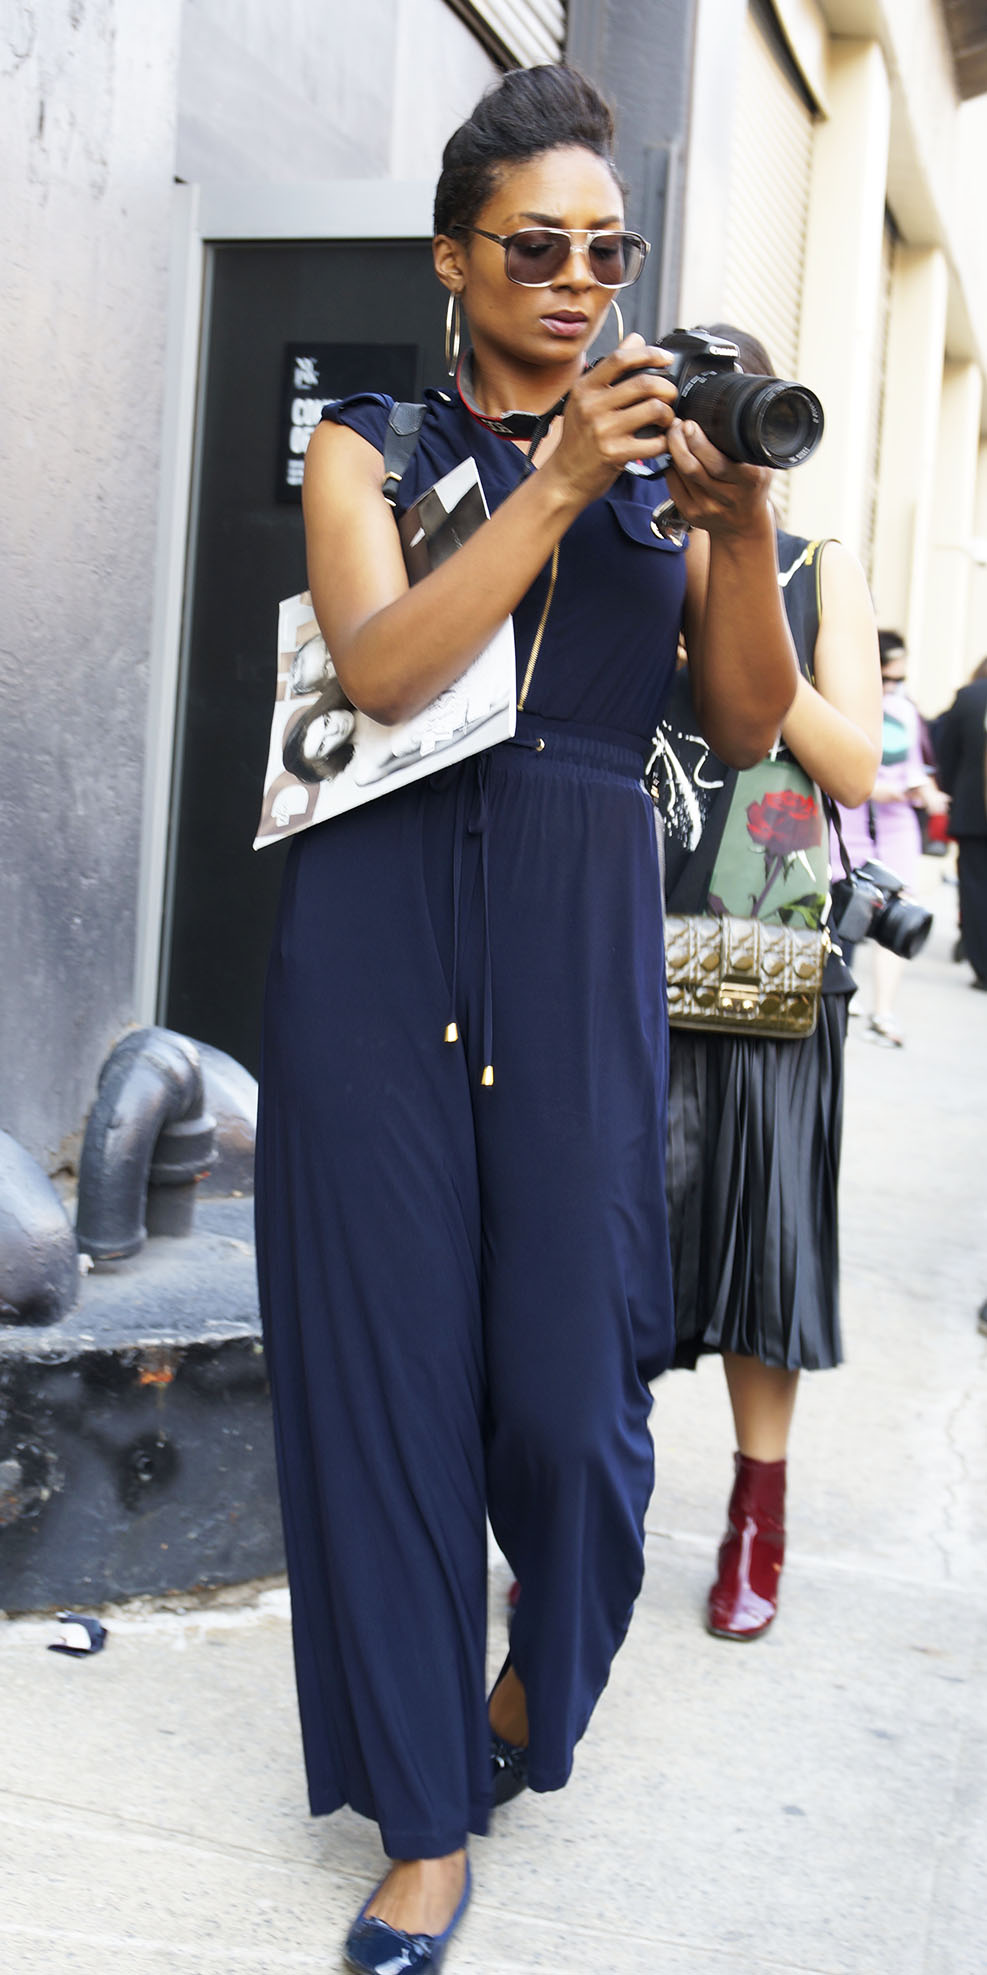 Noa_Baker_street_fashion_photography_new_york_photography